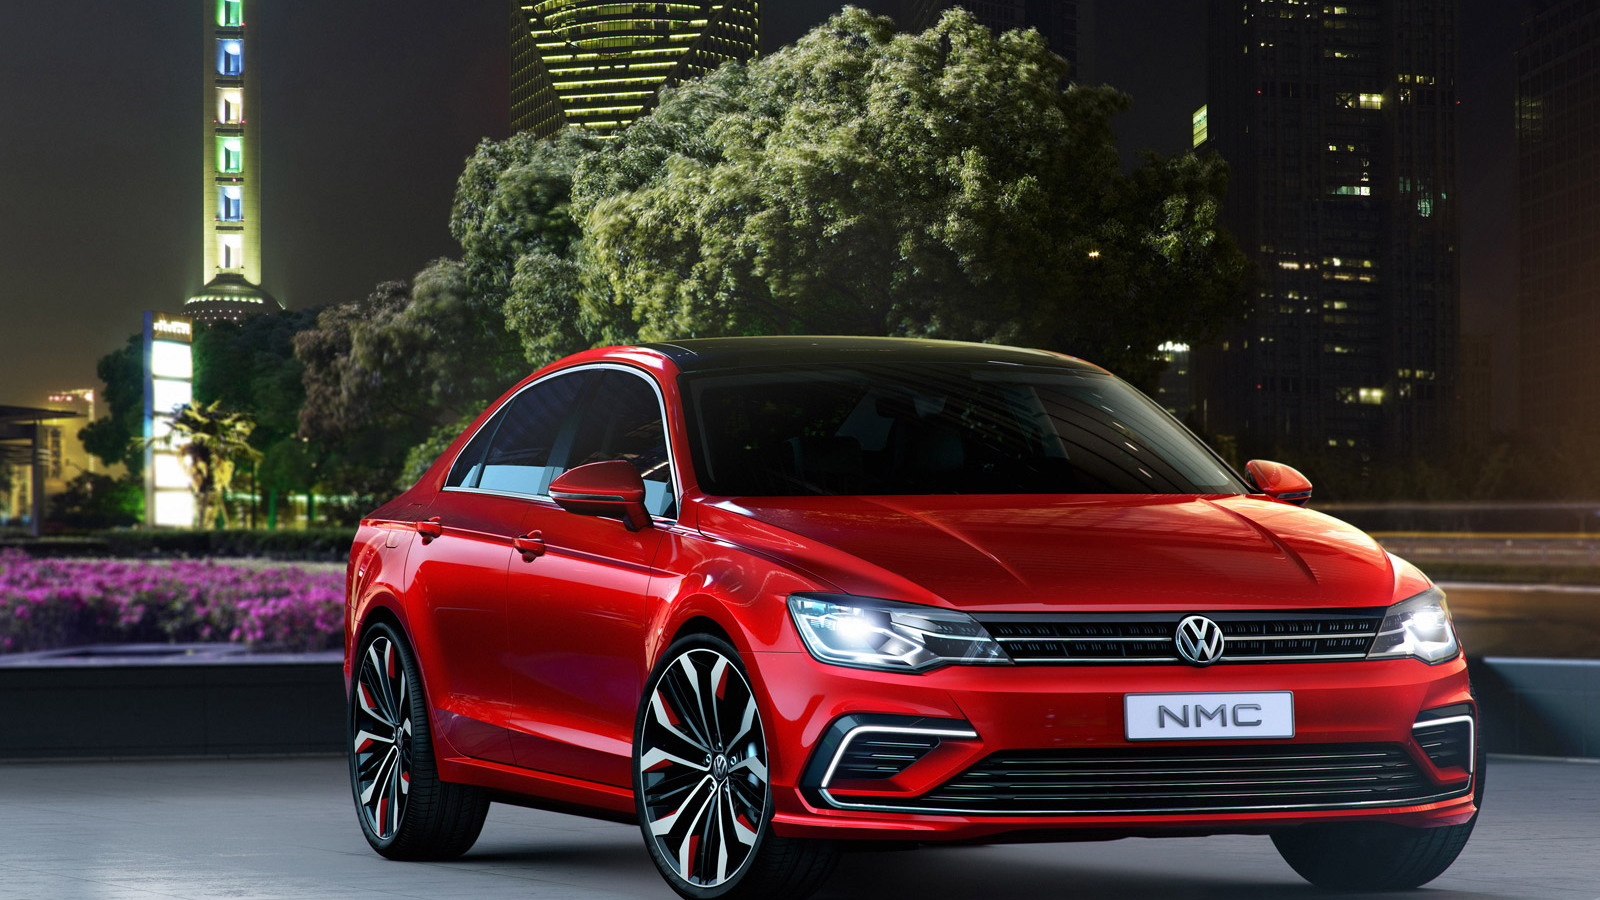 Volkswagen New Midsize Coupe concept, 2014 Beijing Auto Show